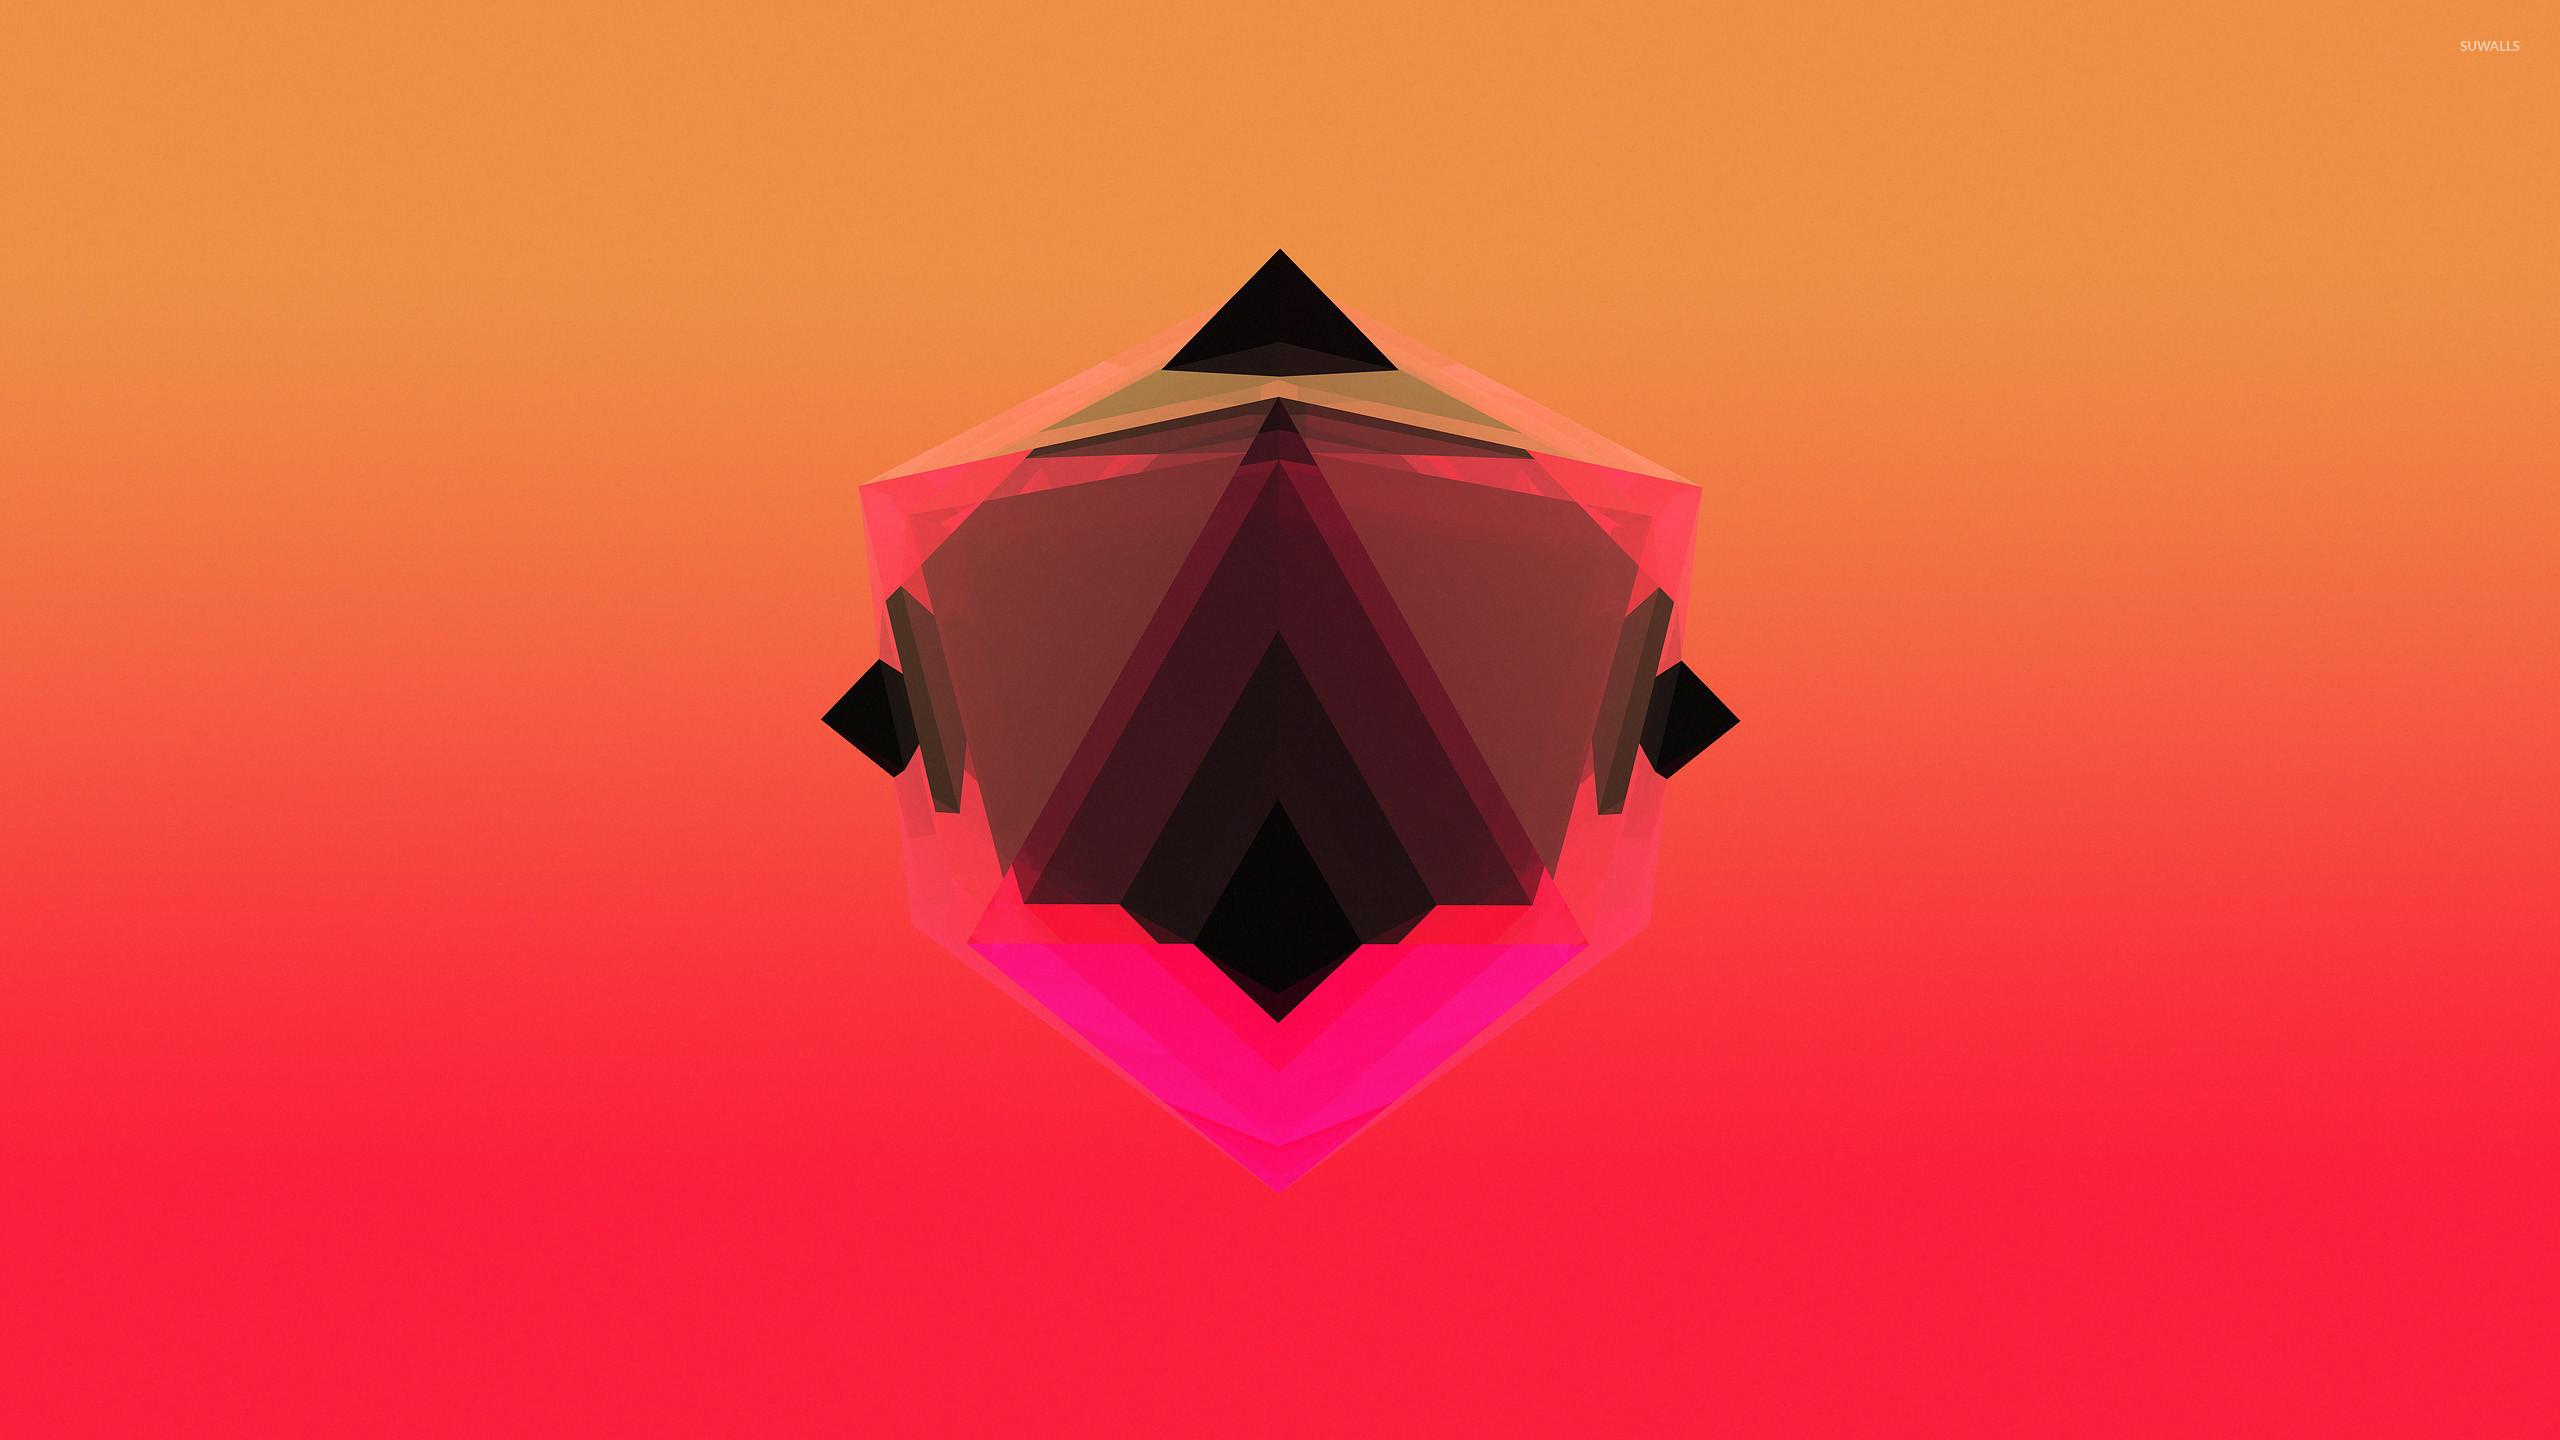 Res: 2560x1440, Dark shape inside a pink diamond wallpaper